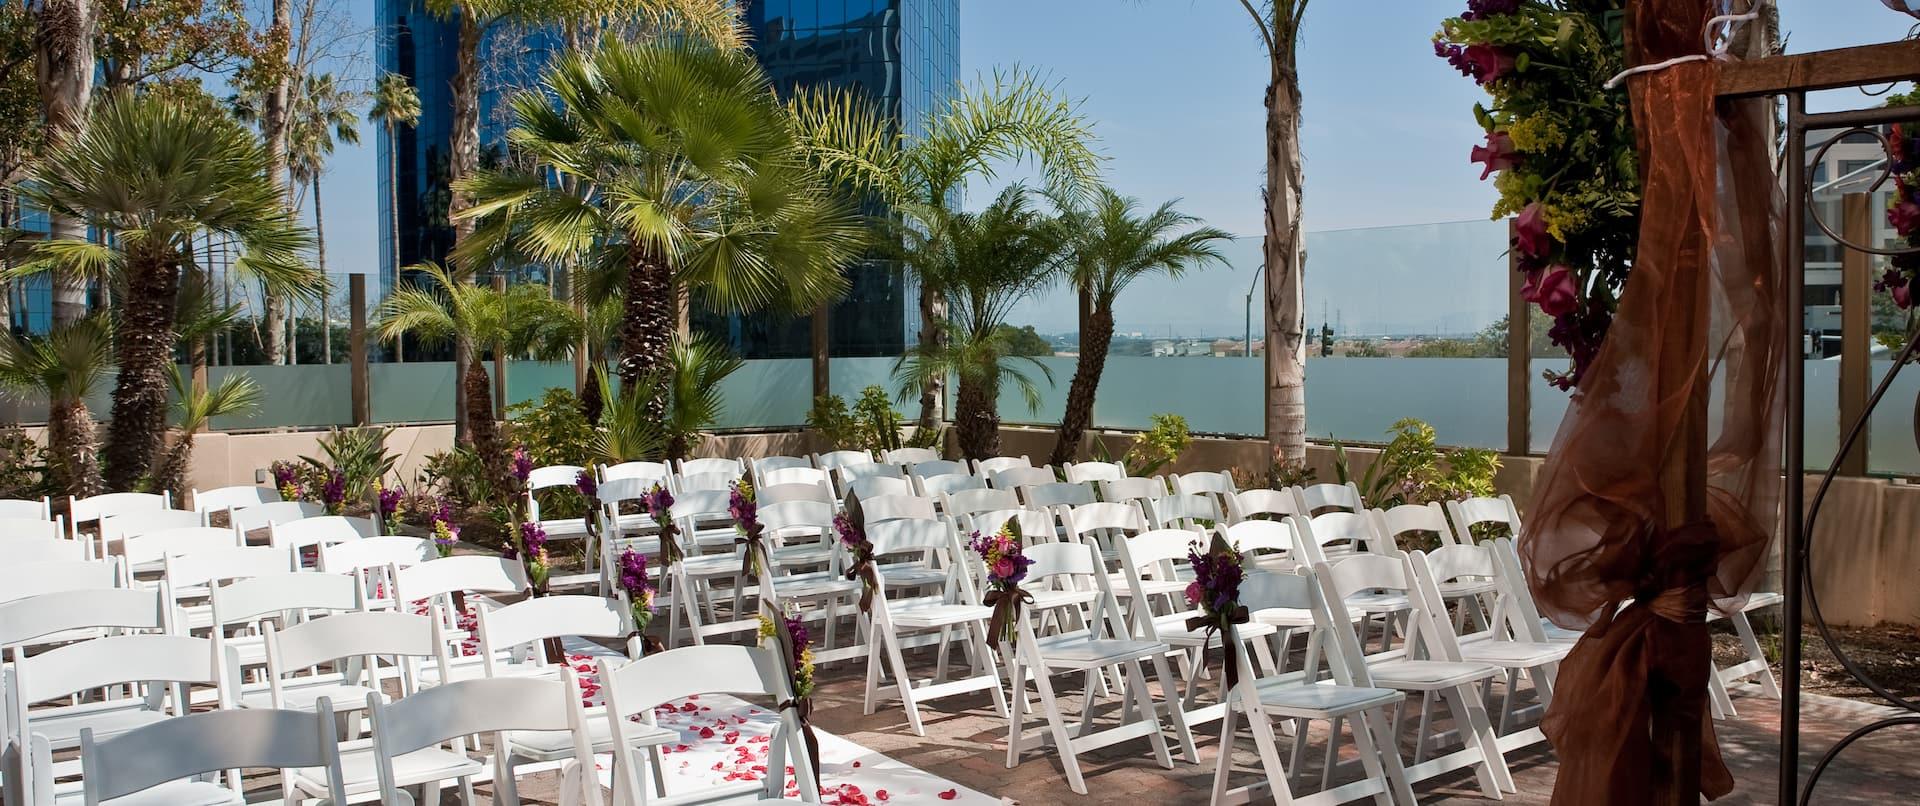 Ceremonies in the Sun